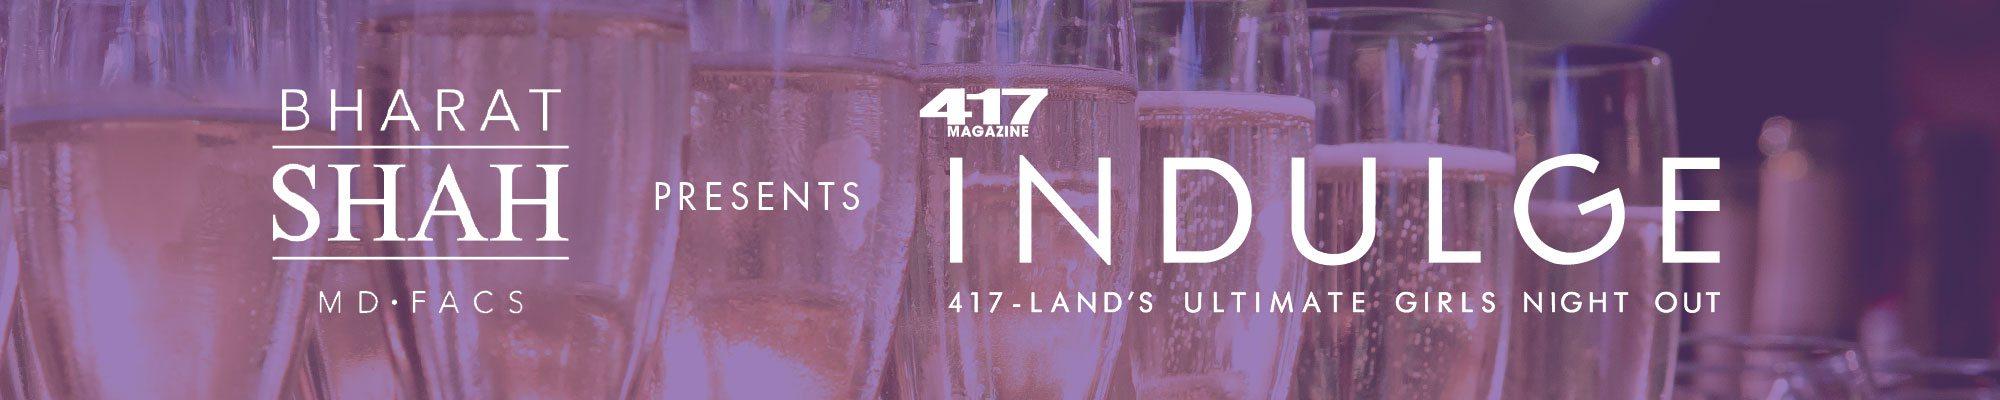 Bharat Shaw MD, FACS presents 417 Magazine's Indulge